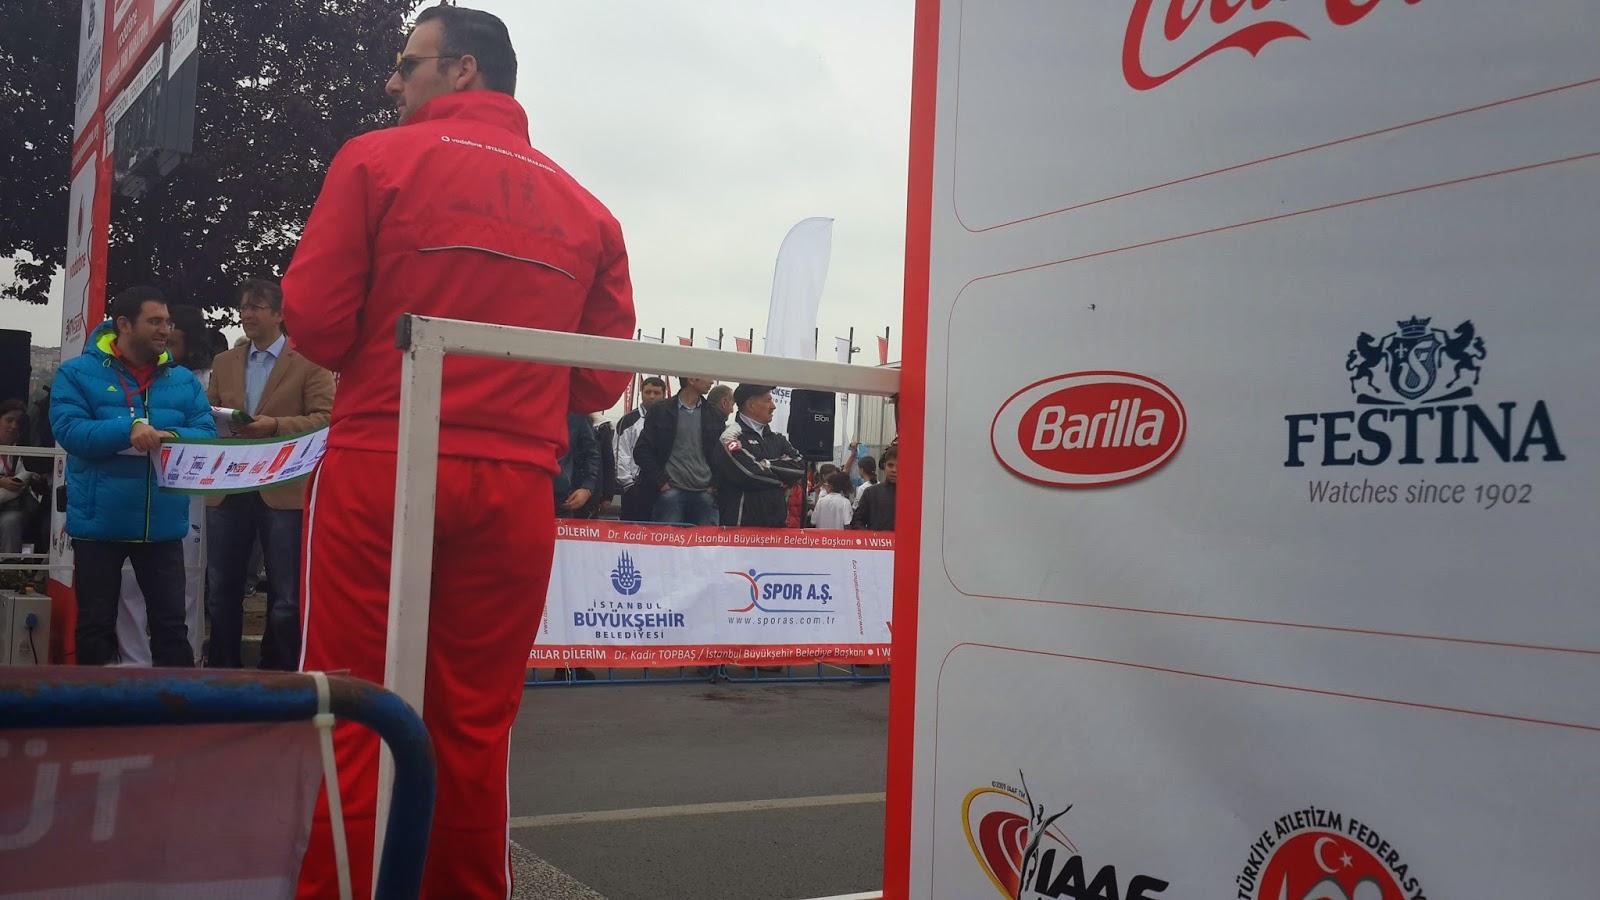 Vodafone Yarı İstanbul Maratonu 2014 Nisan Barilla Festina